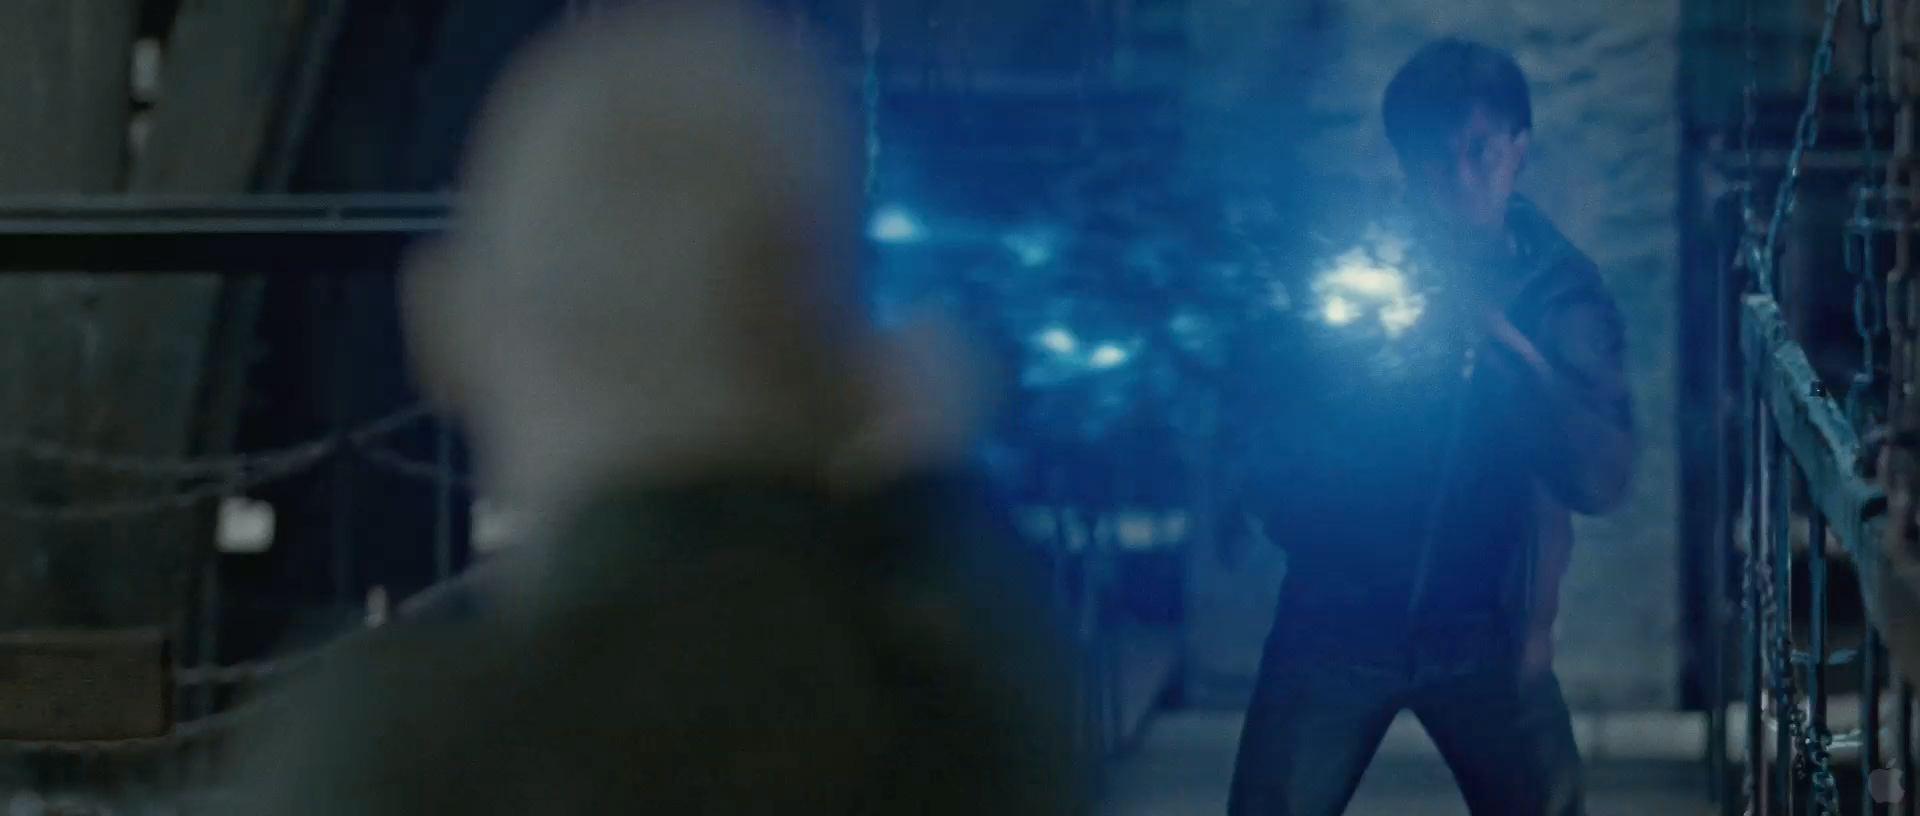 Harry Potter BlogHogwarts HP7 2 Trailer 90